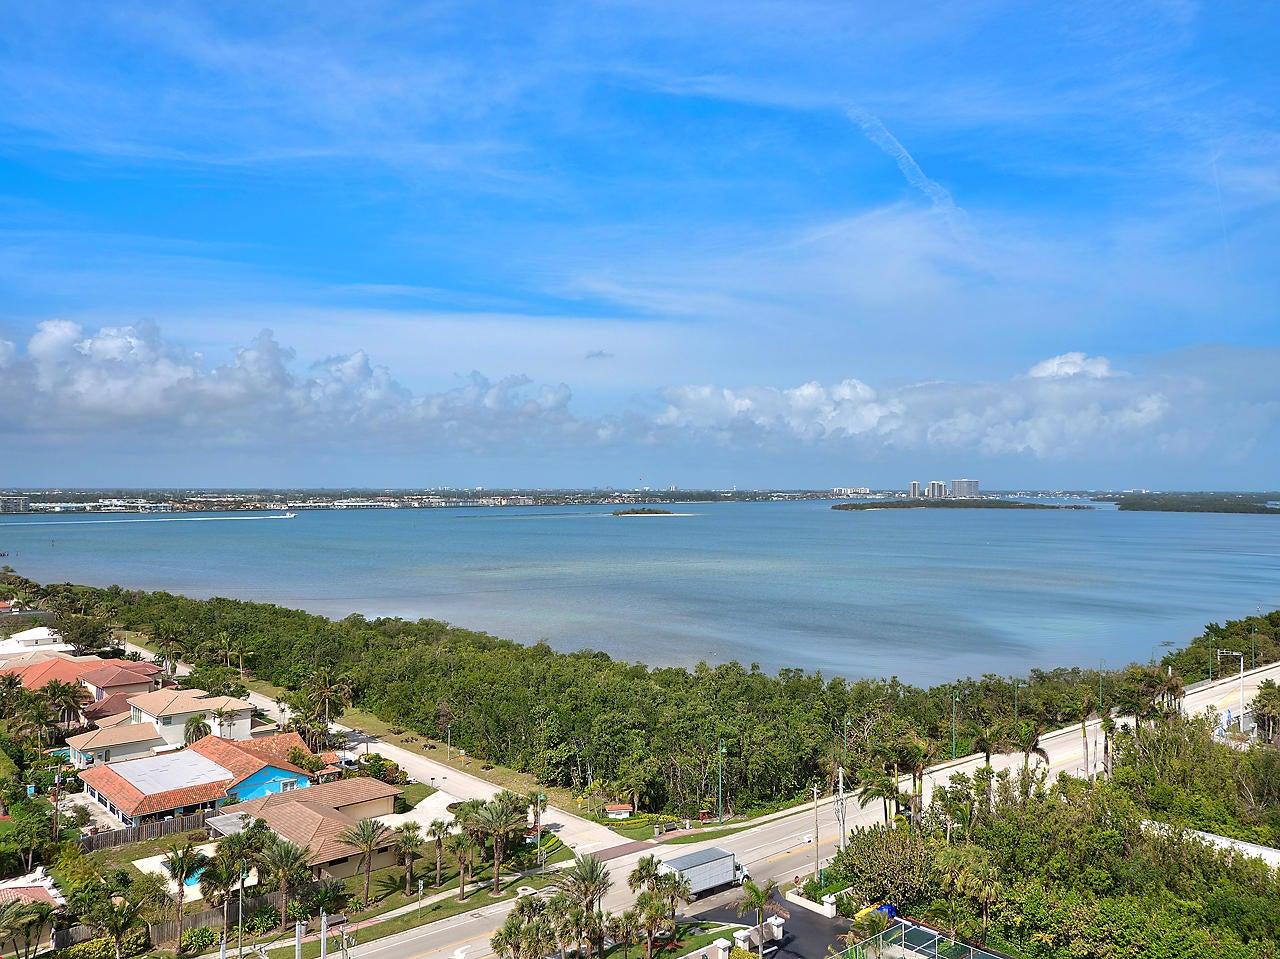 SINGER ISLAND FLORIDA